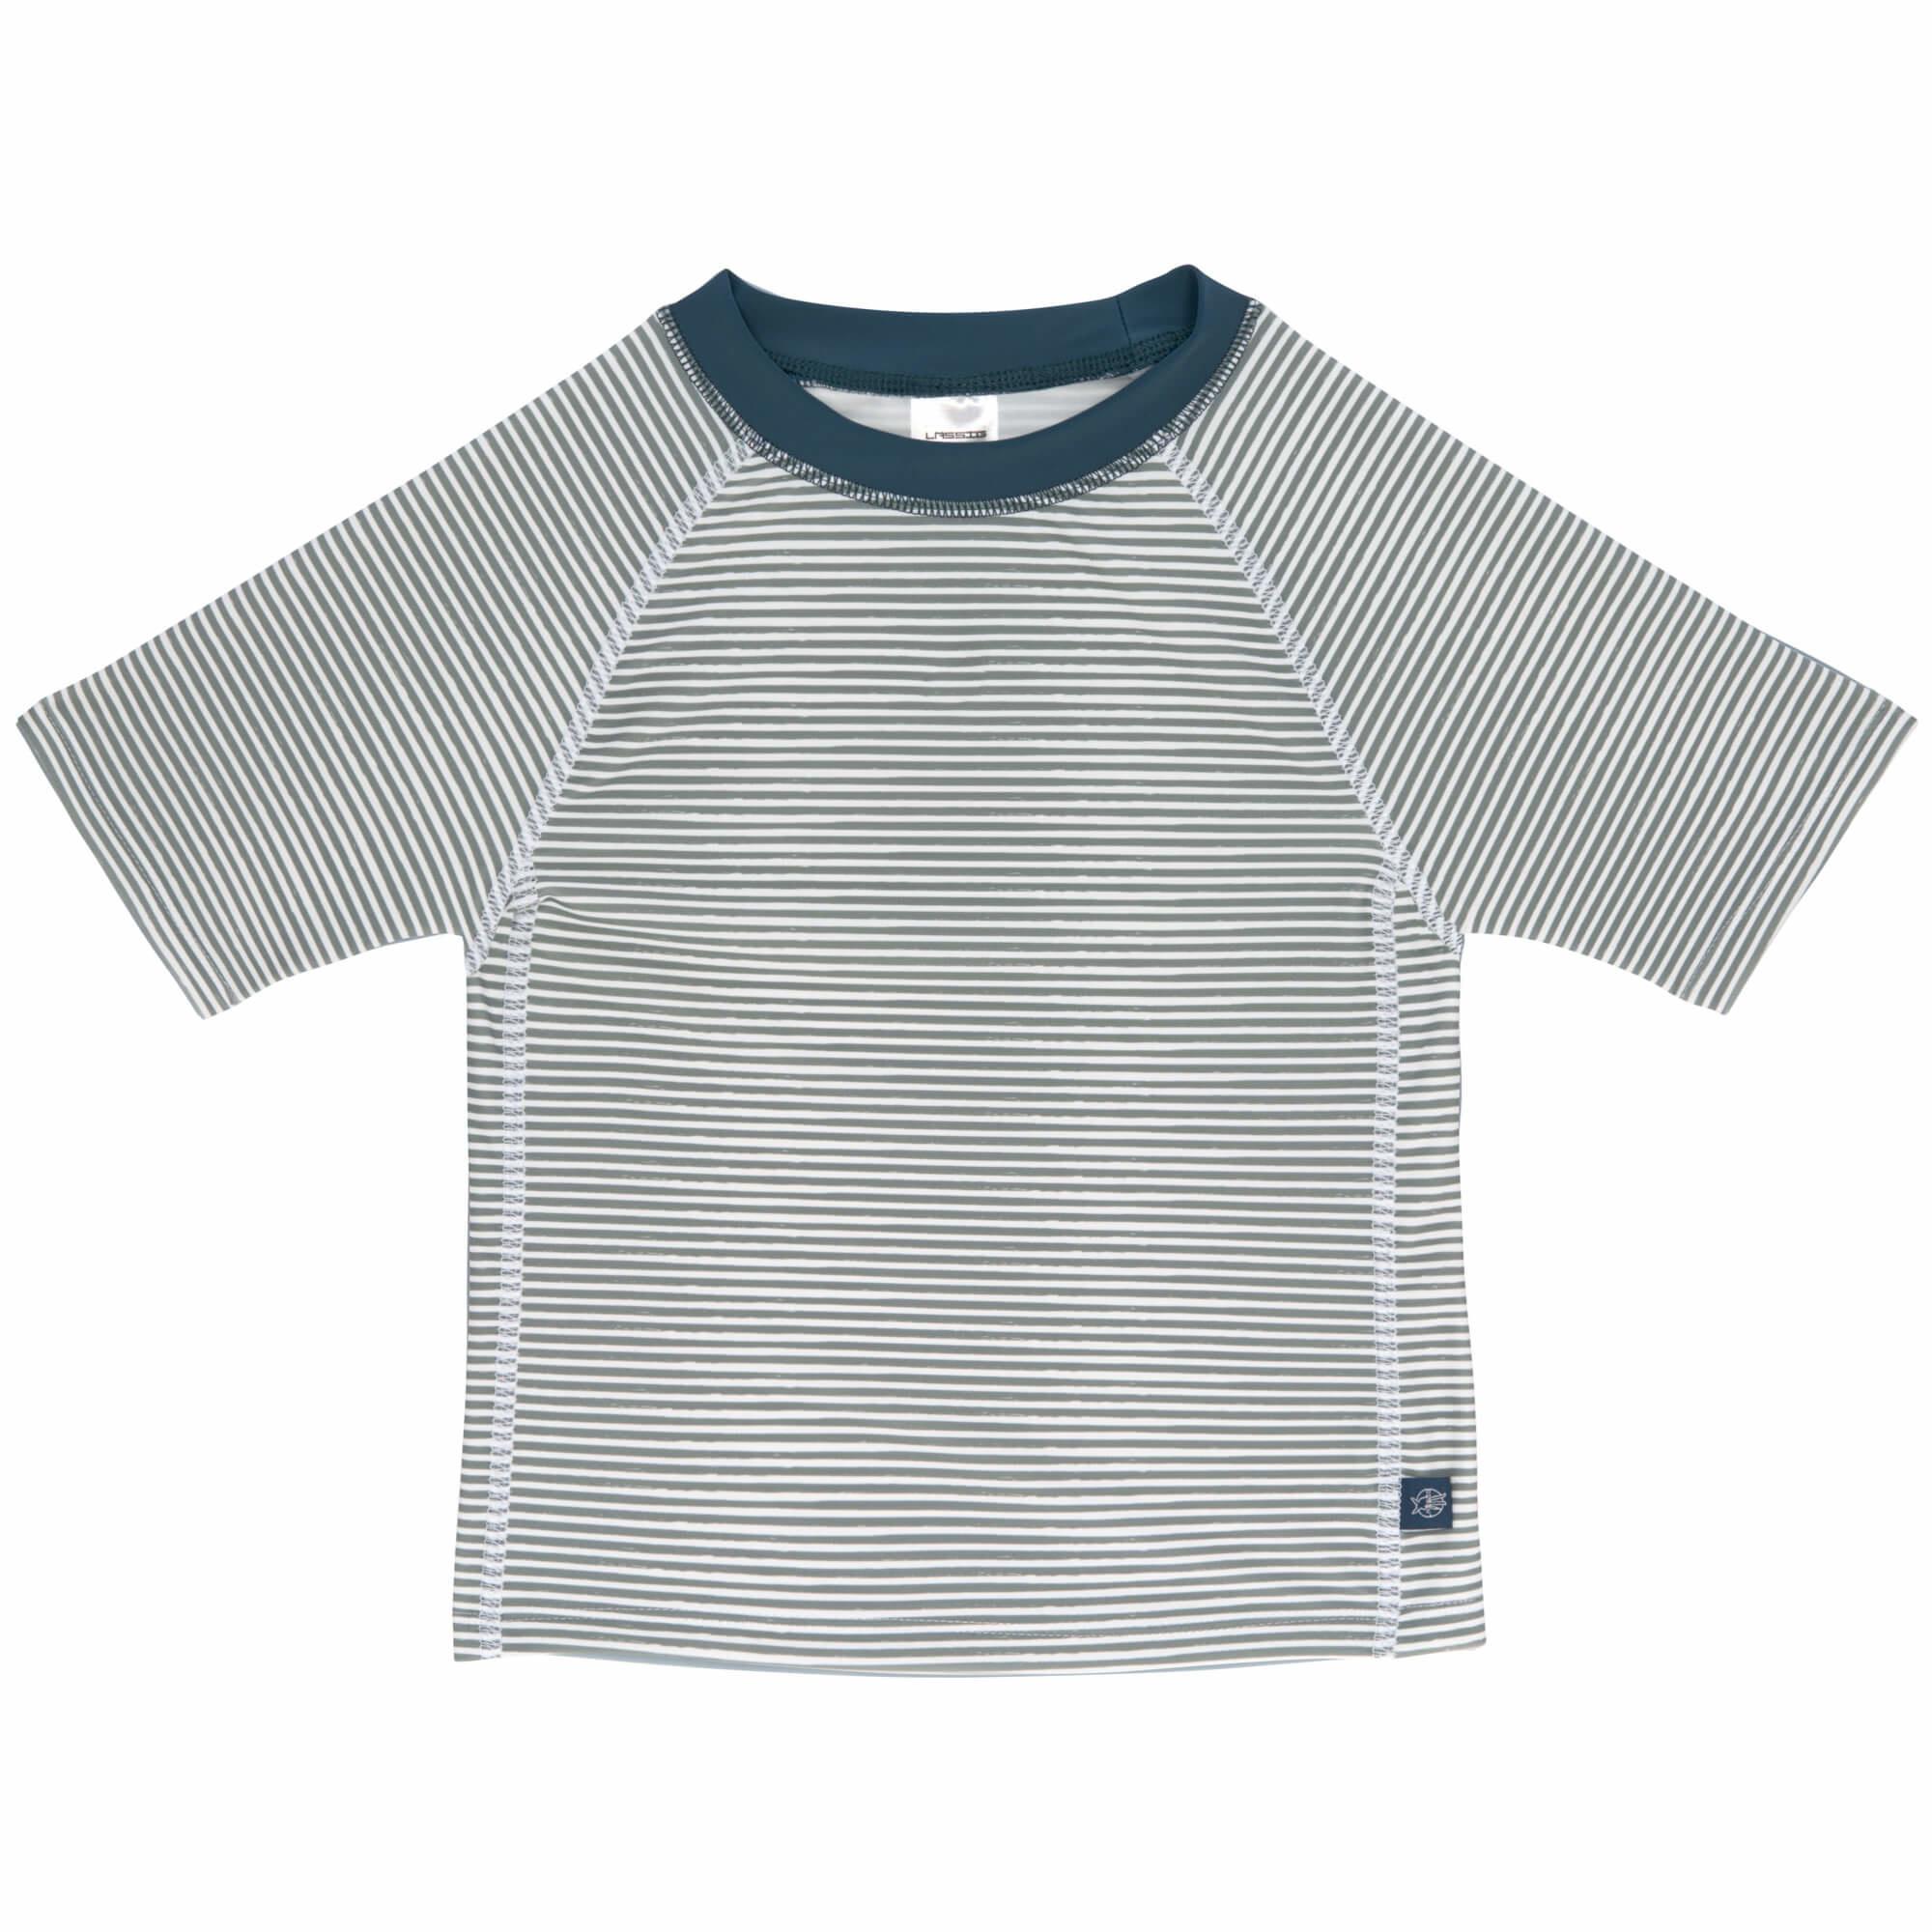 Lässig Splash & Fun Korte mouw Rashguard / zwemshirt Striped blue